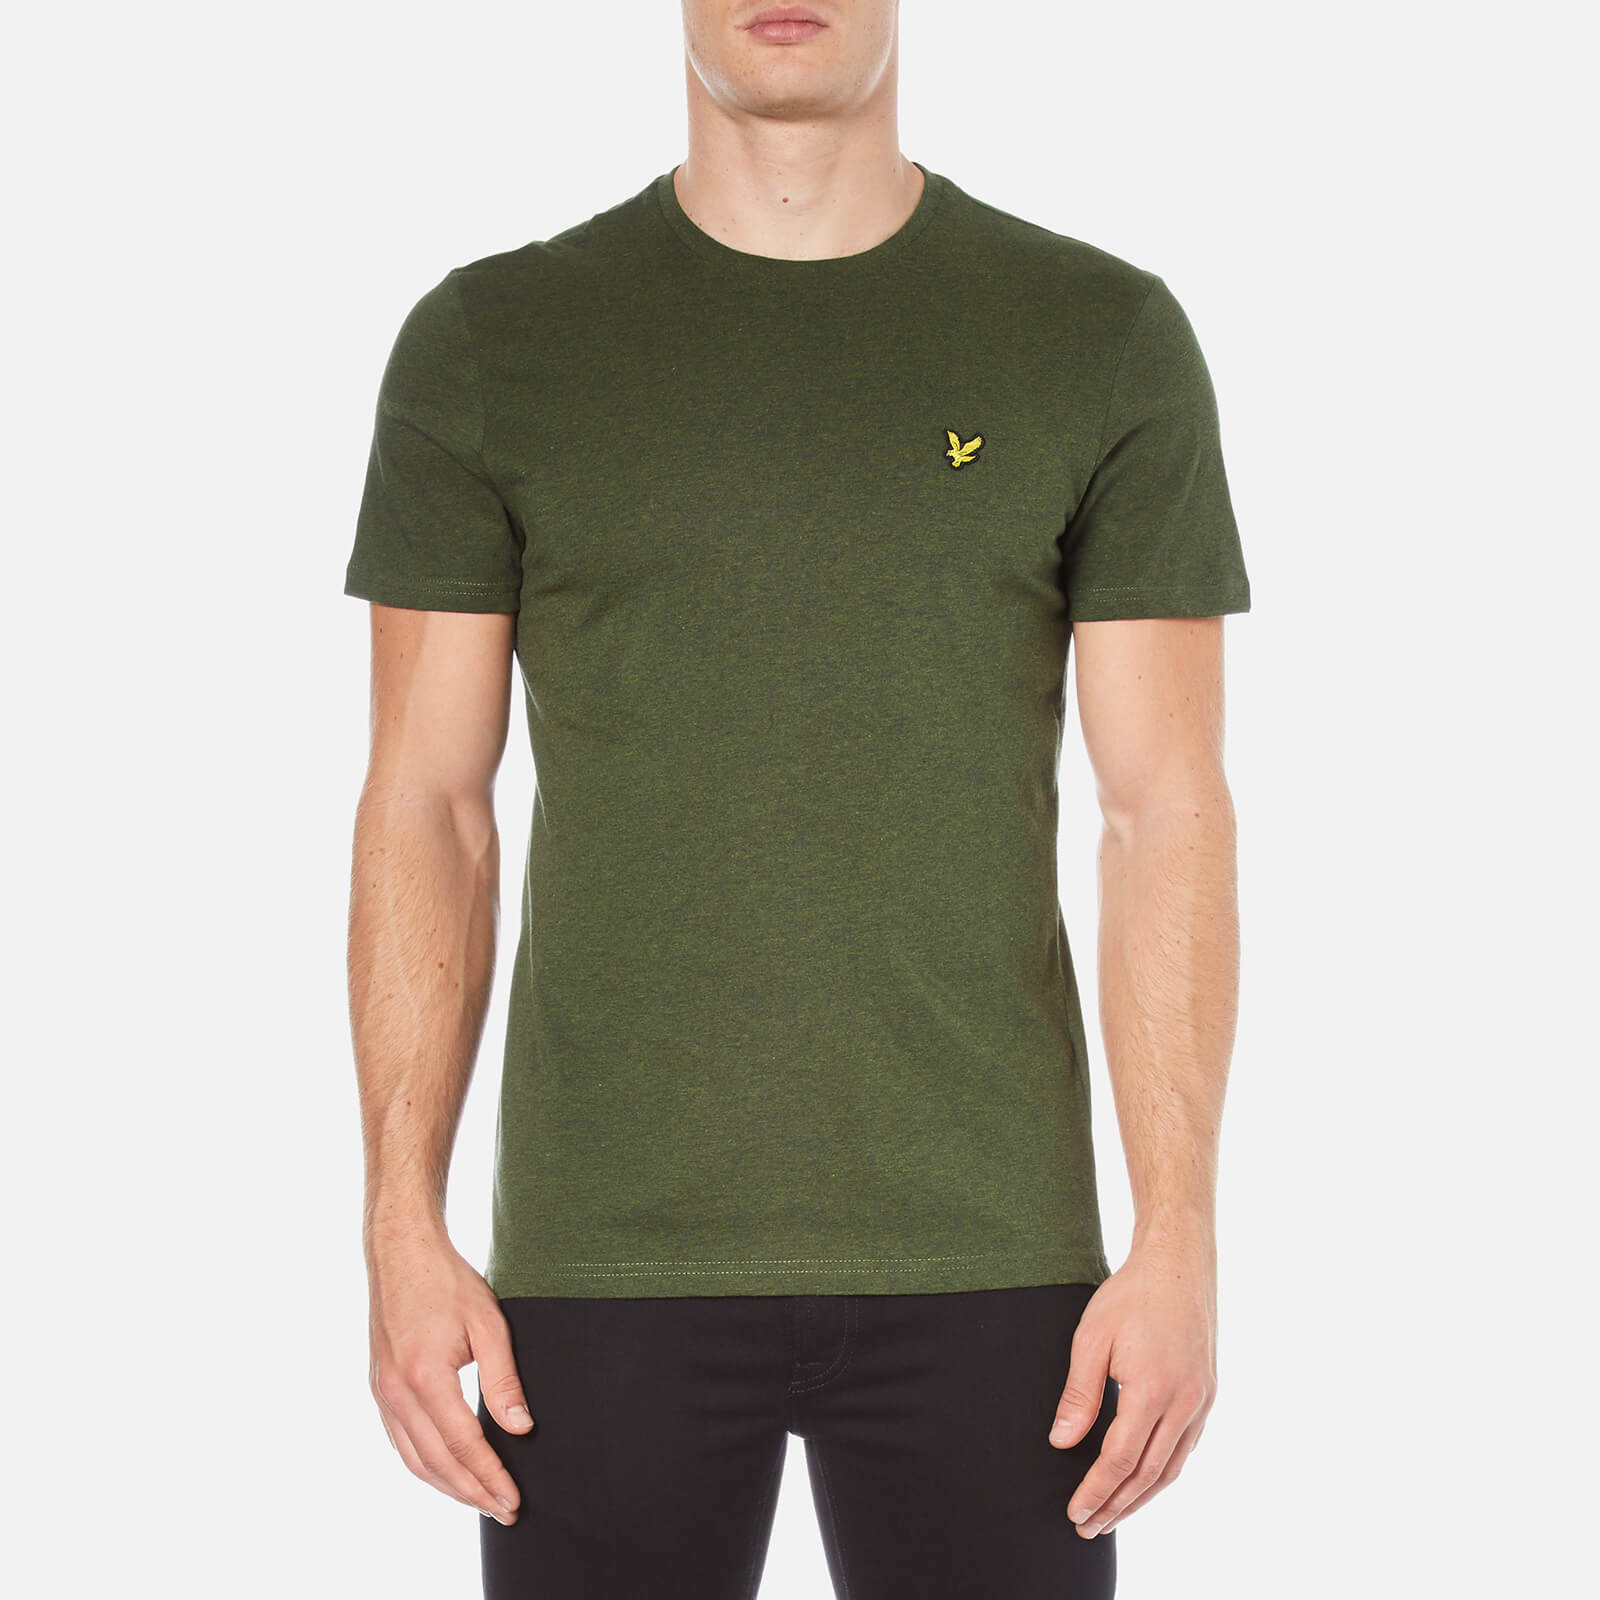 35c8df575e98d Lyle & Scott Men's Crew Neck T-Shirt - Dark Sage Clothing | TheHut.com